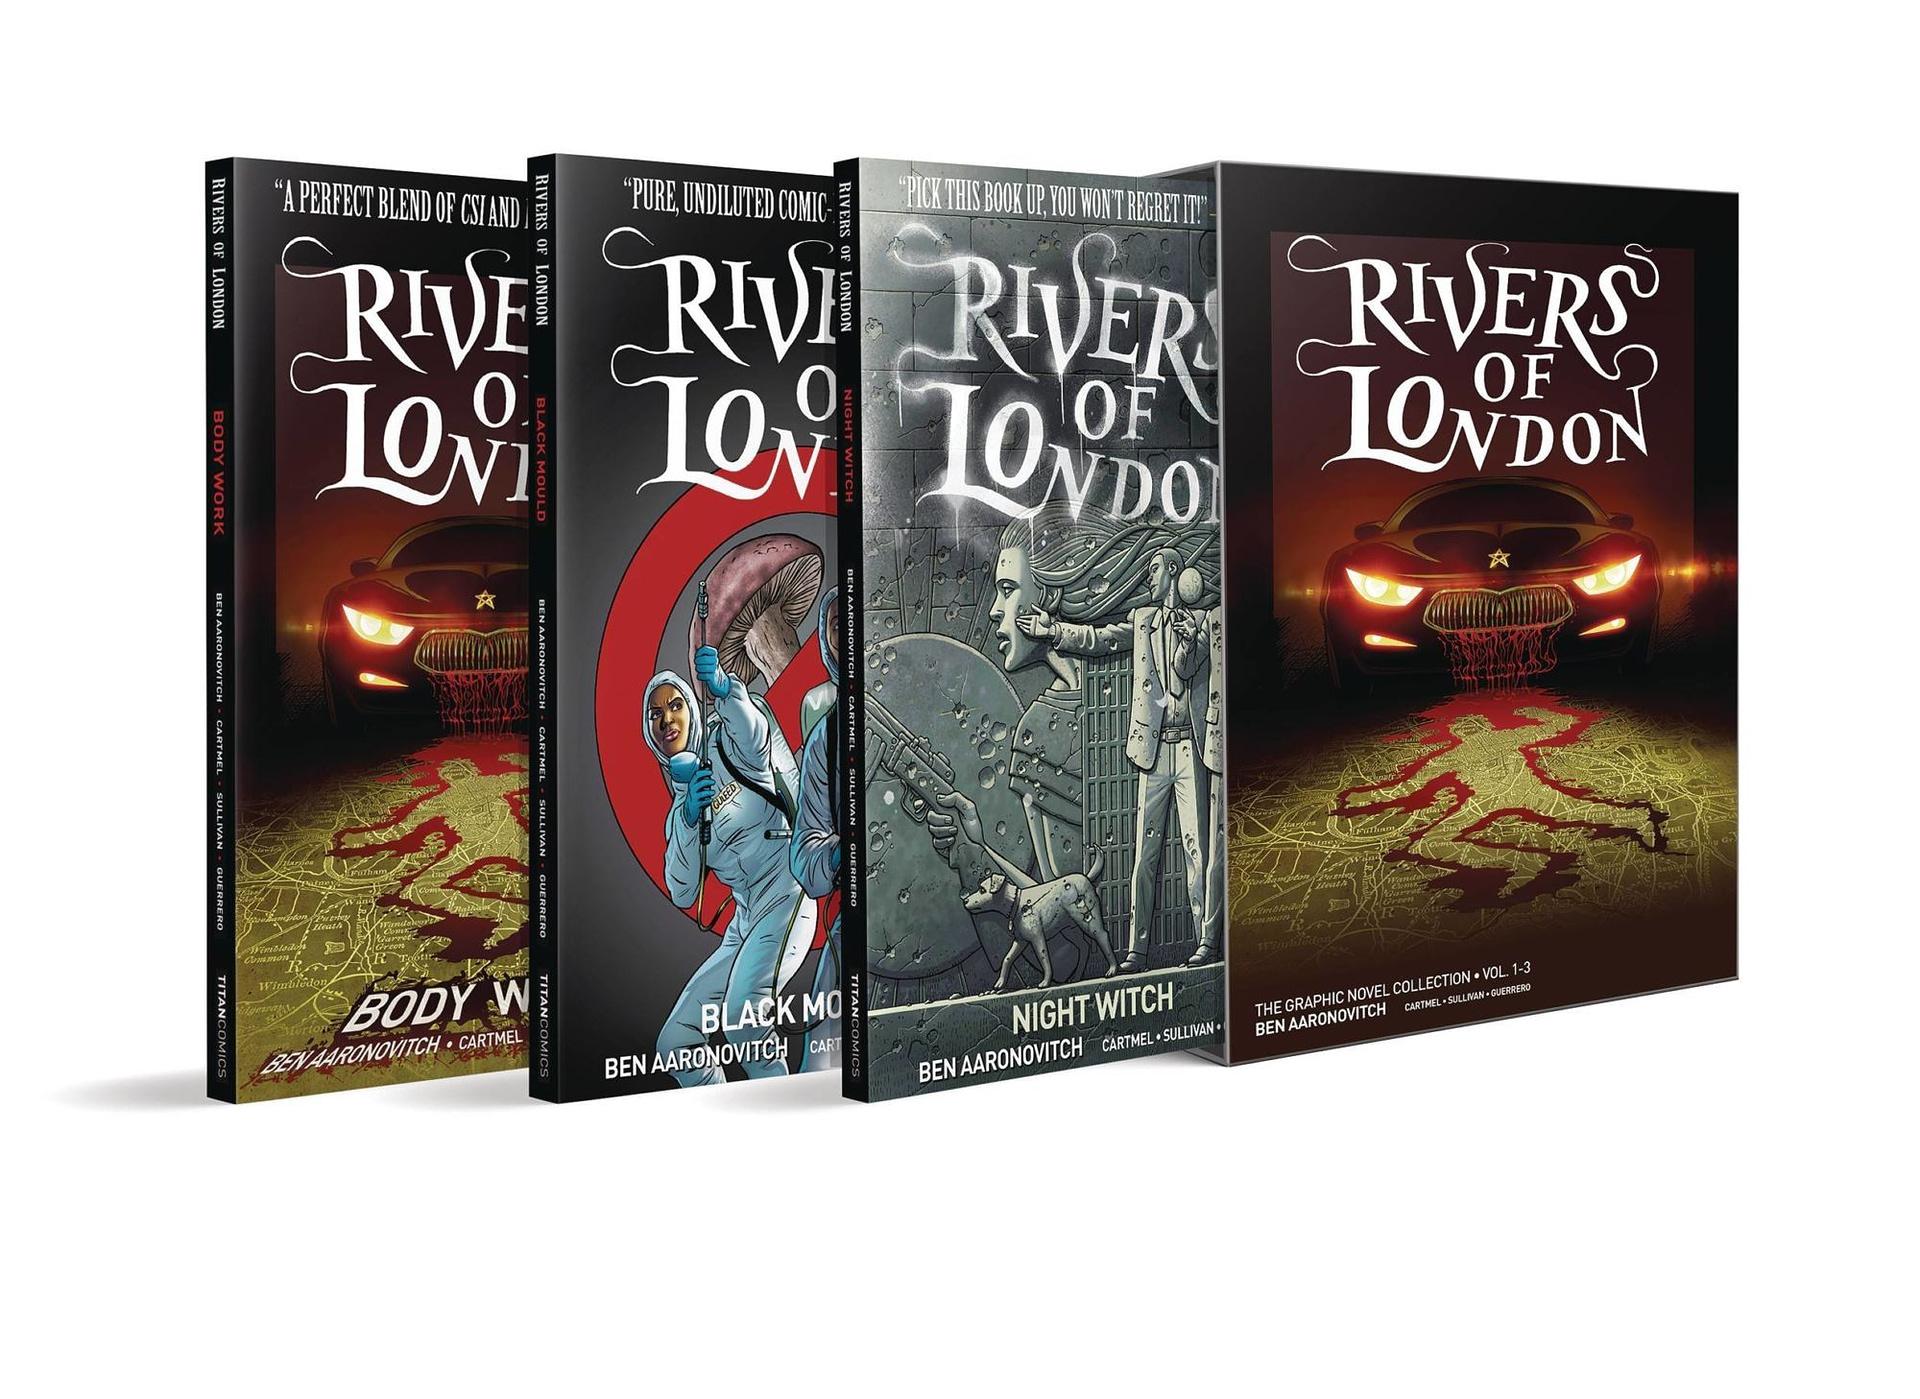 RIVERS OF LONDON TP VOL 01-03 BOX SET ED (O/A) (MR)